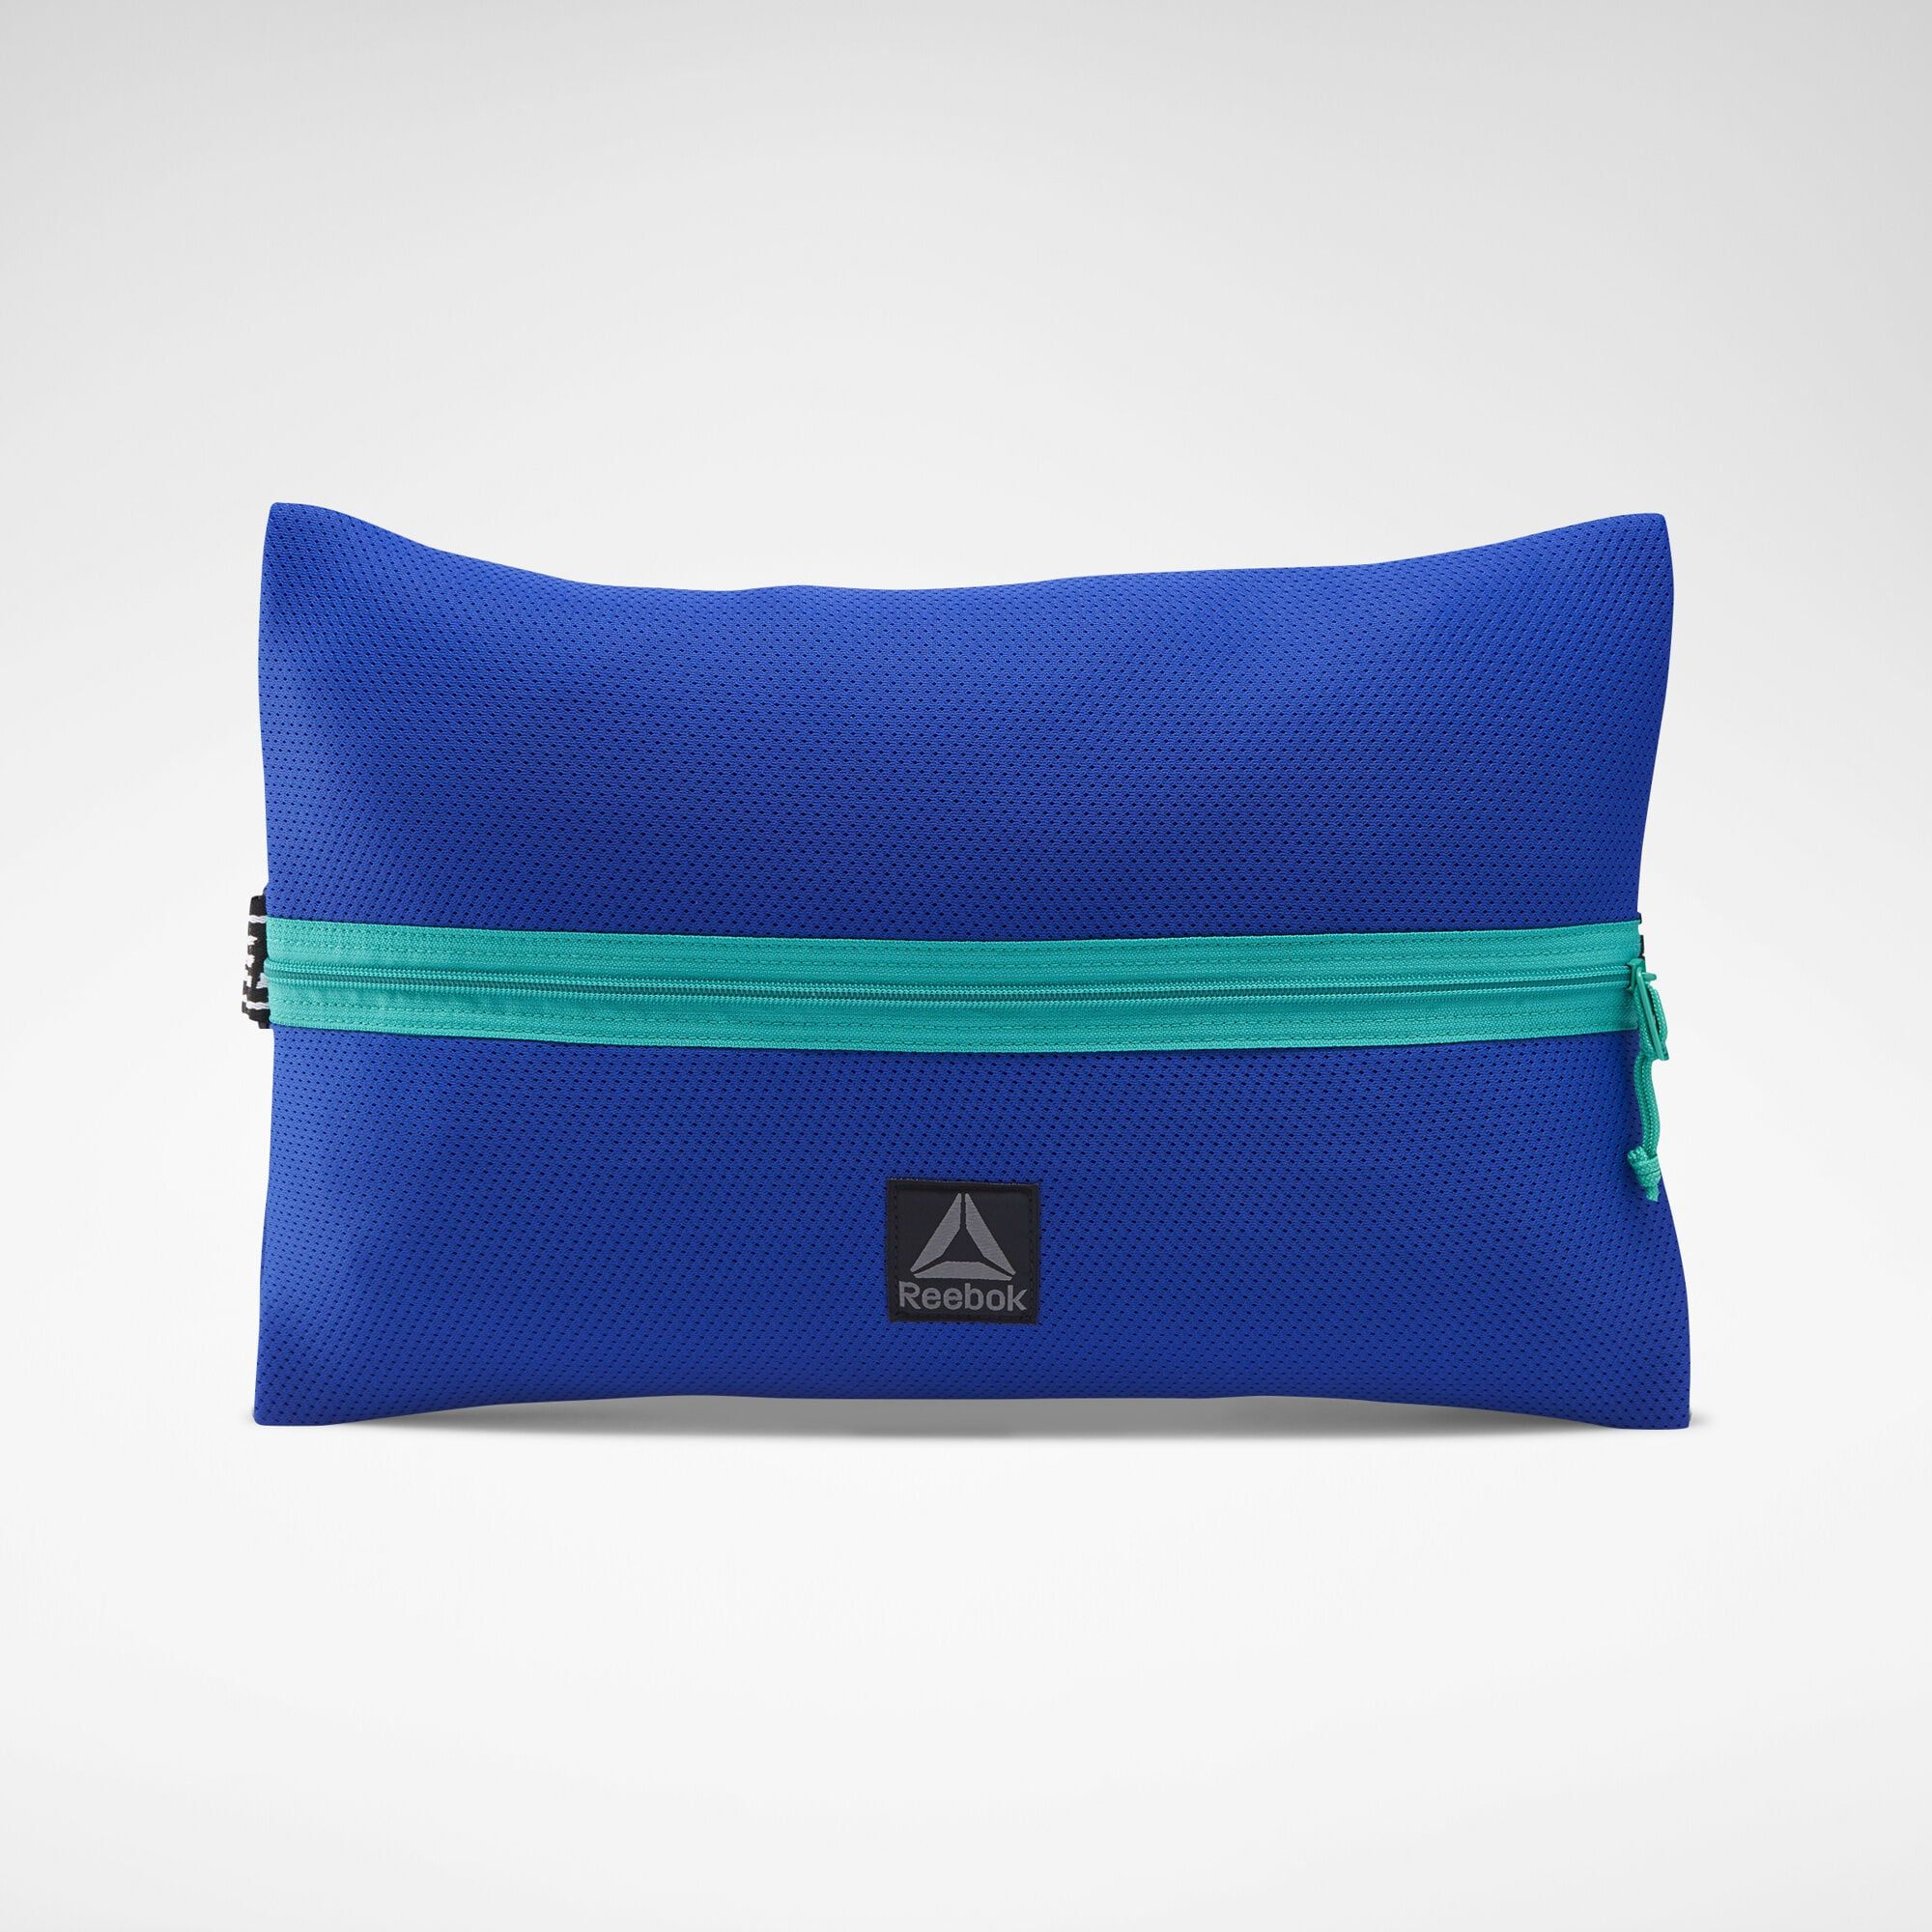 Tasche ´ Imagiro Meet You There Bag ´